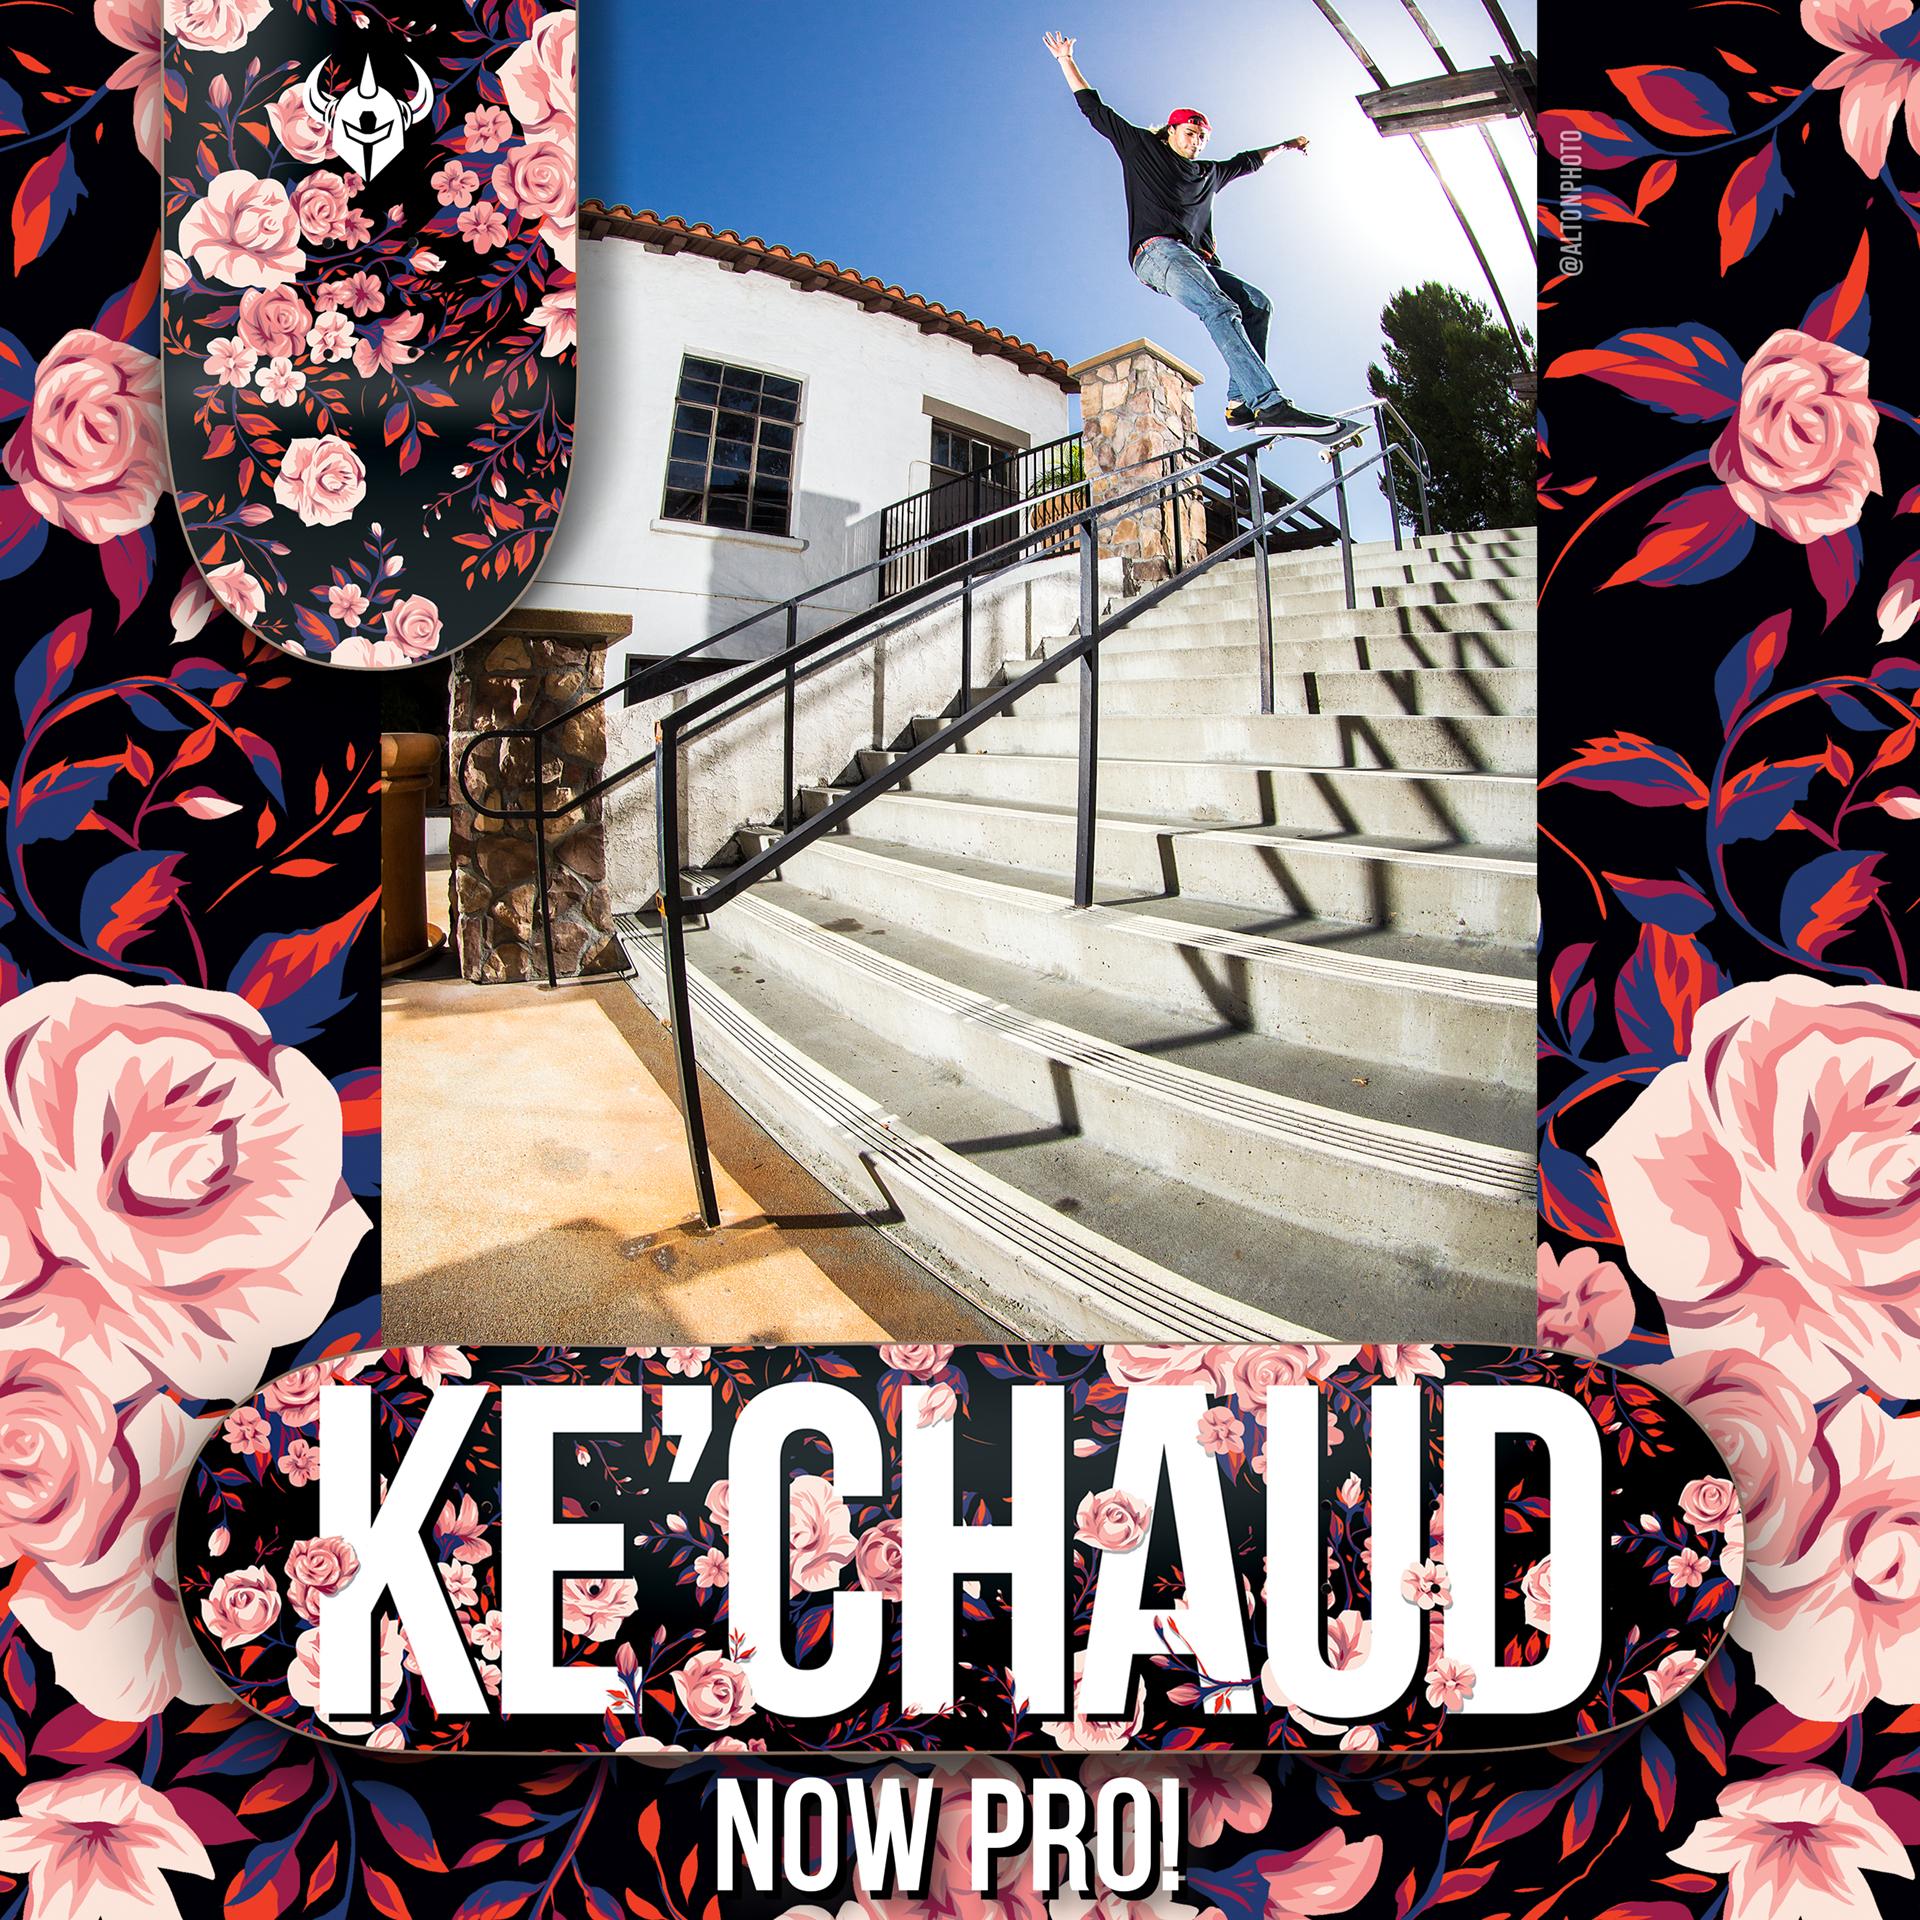 Darkstar-Skateboards-Kechaud-NowPro.jpg